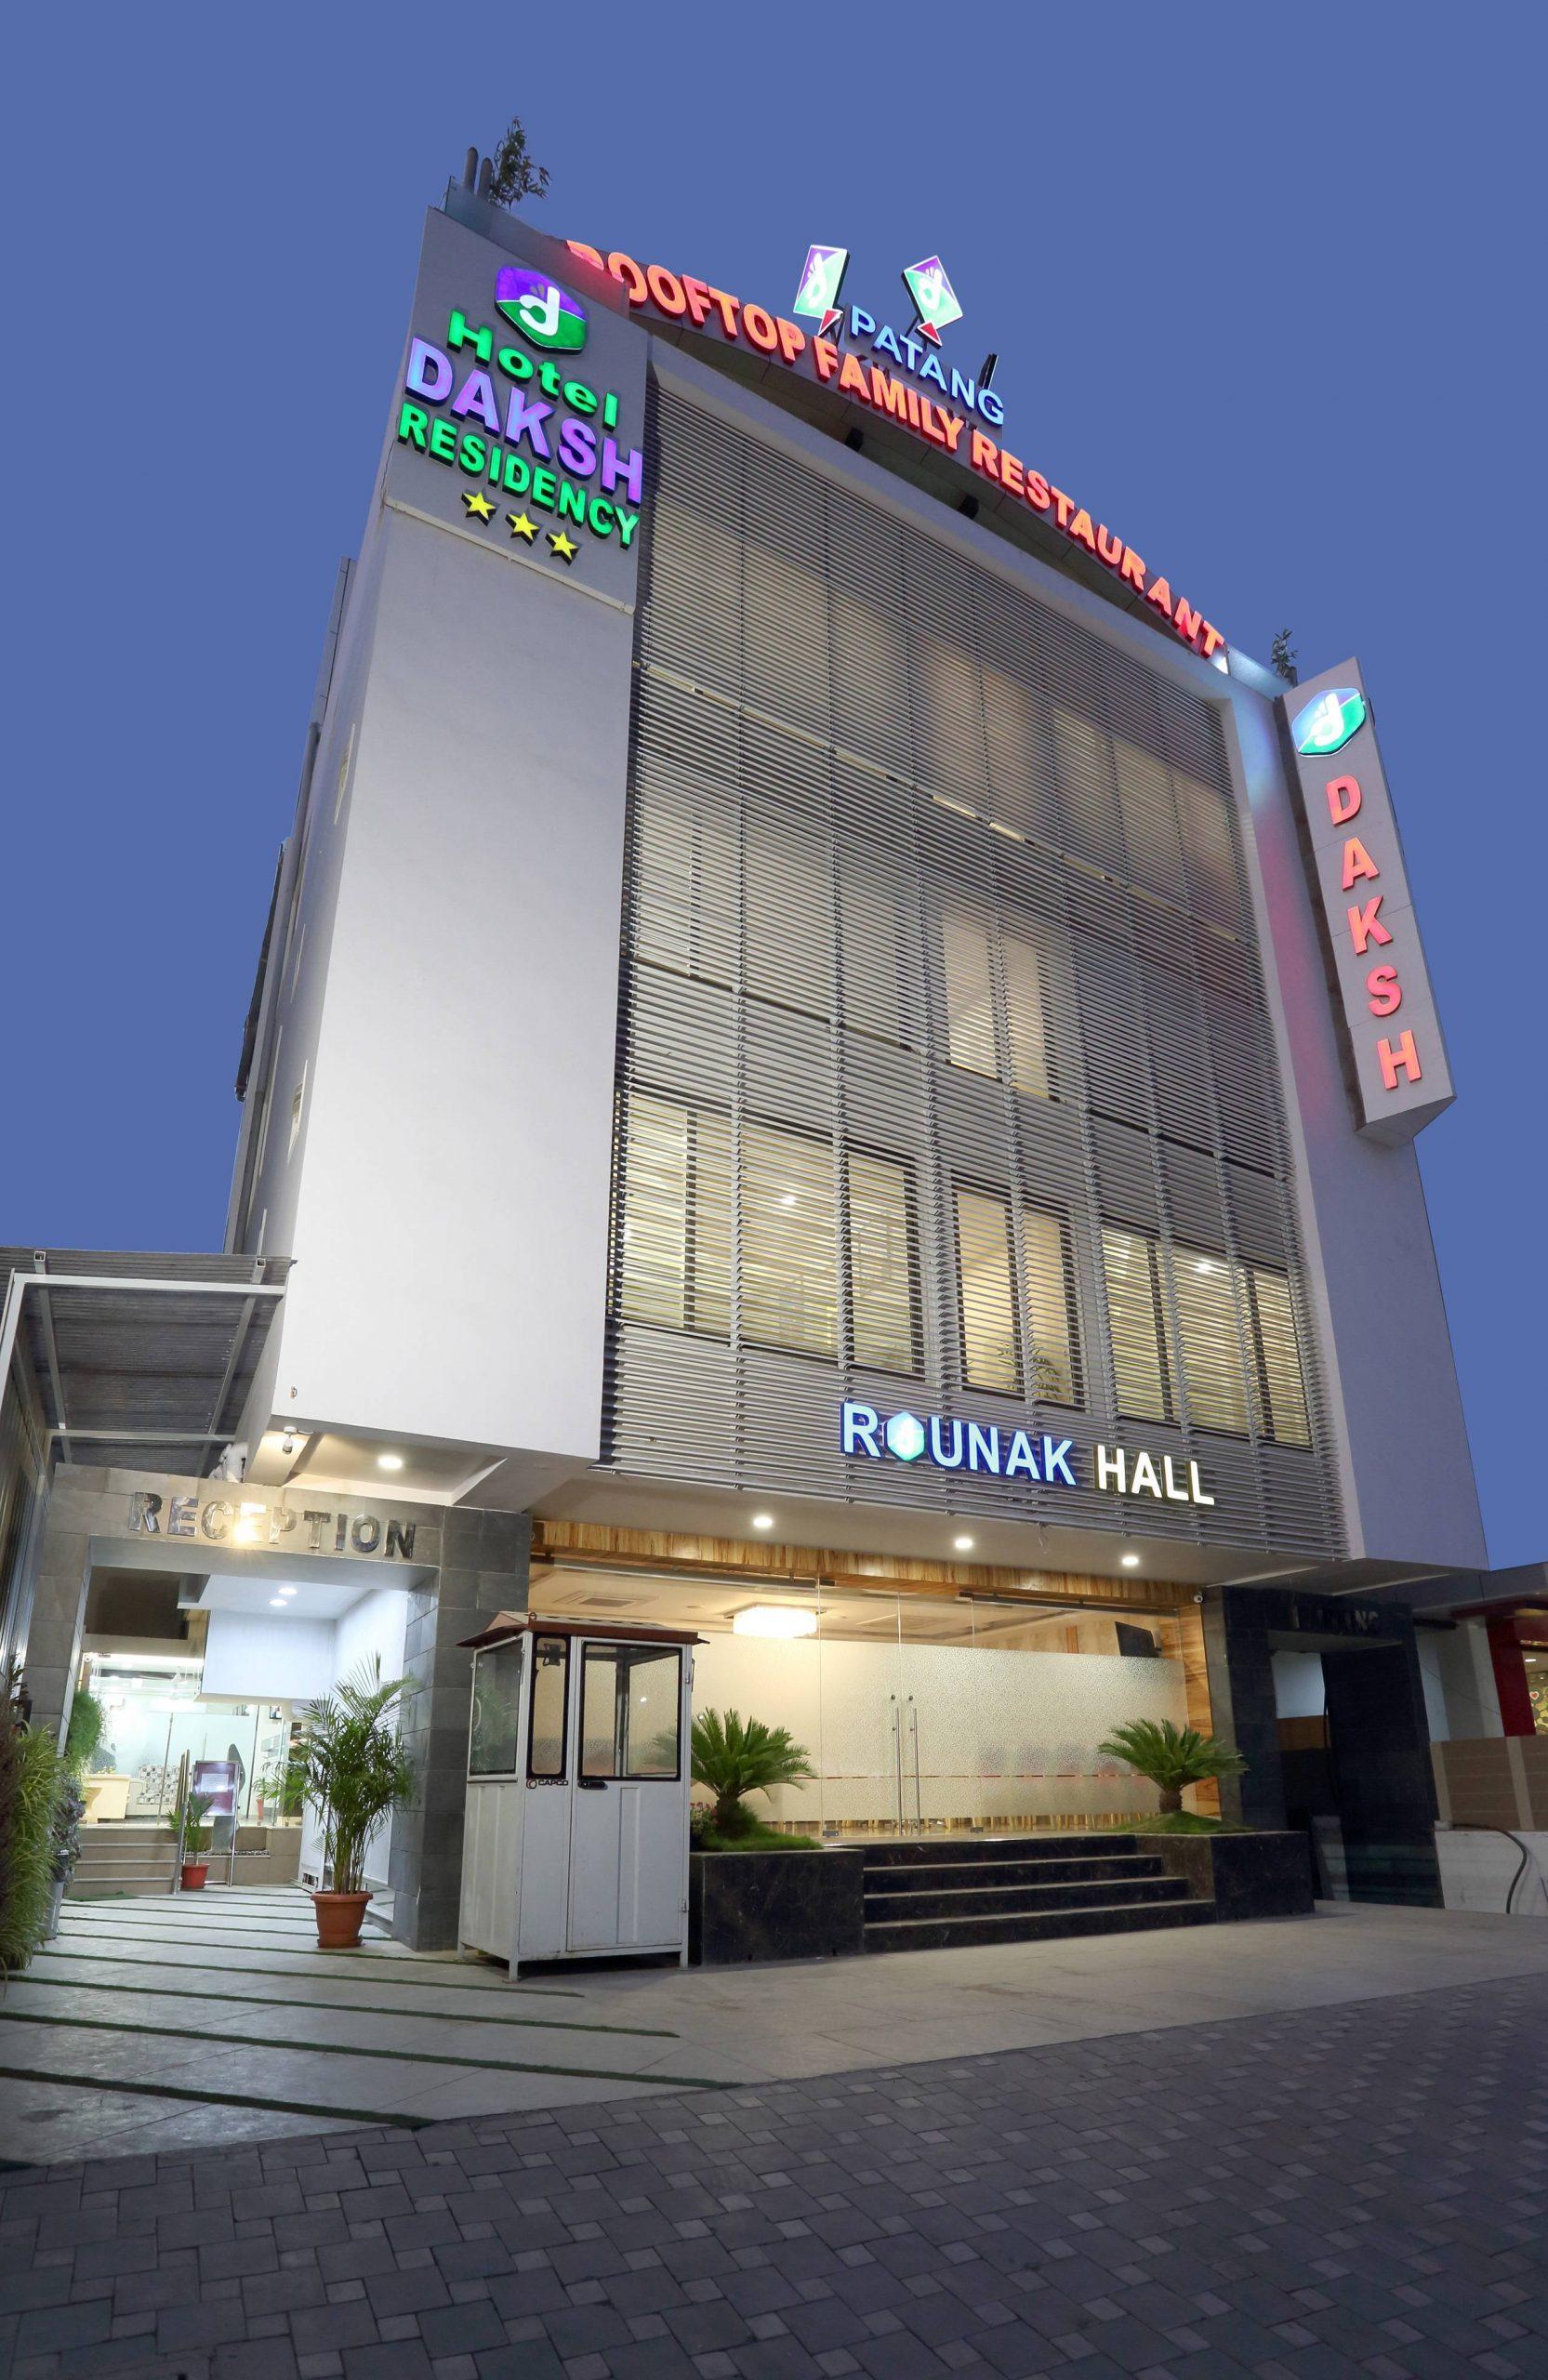 Top Budget Hotel in Indore-Daksh Residency